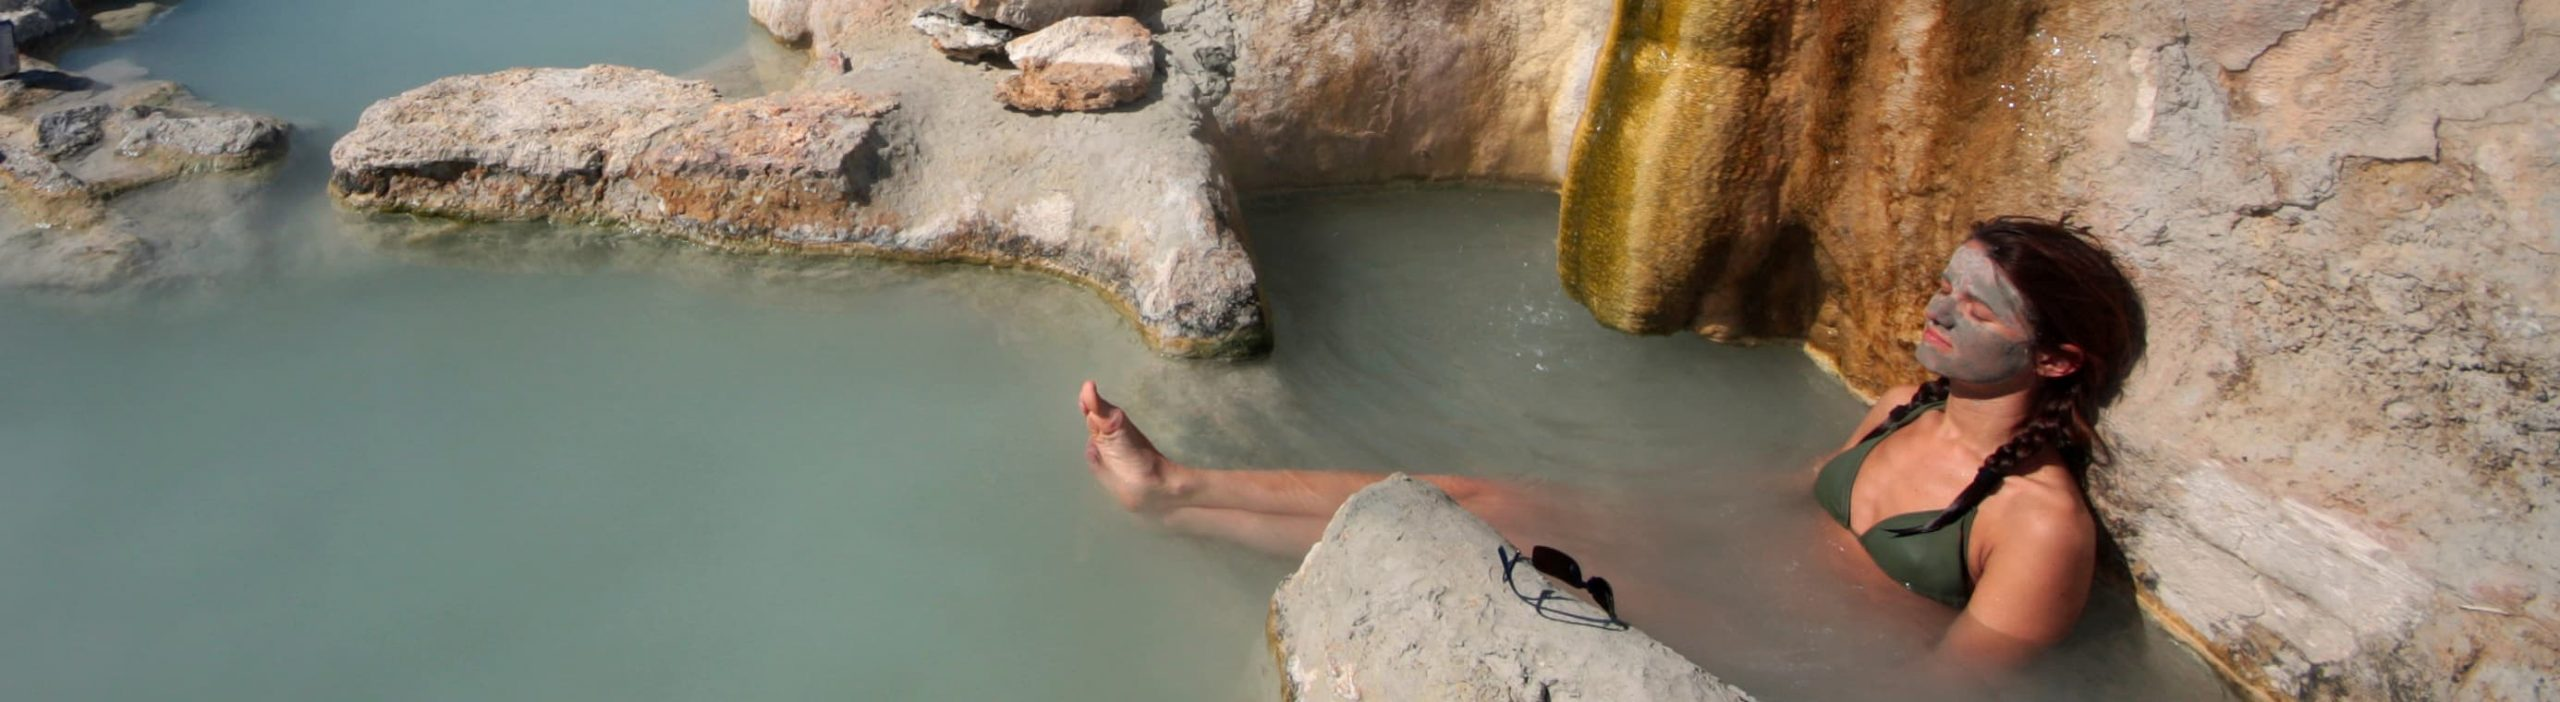 California Hot Springs Mud Bath